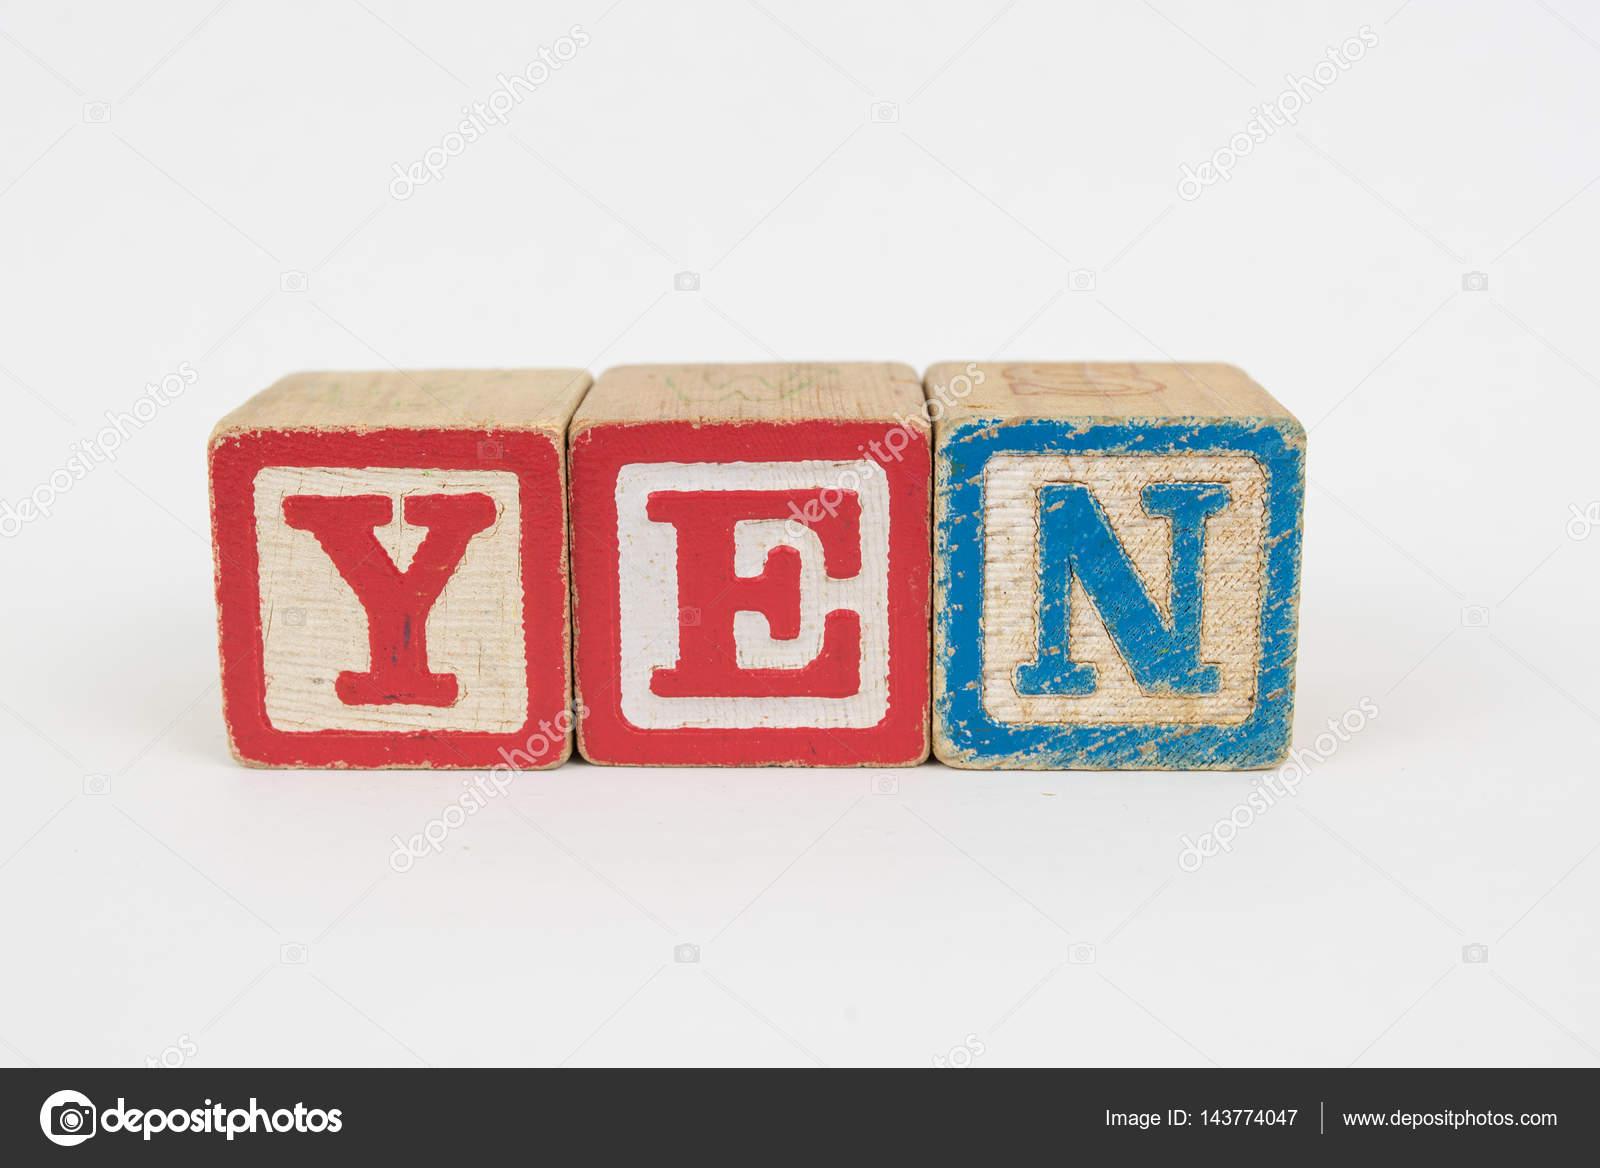 The Word Yen In Wooden Childrens Blocks Stock Photo Jhlemmer